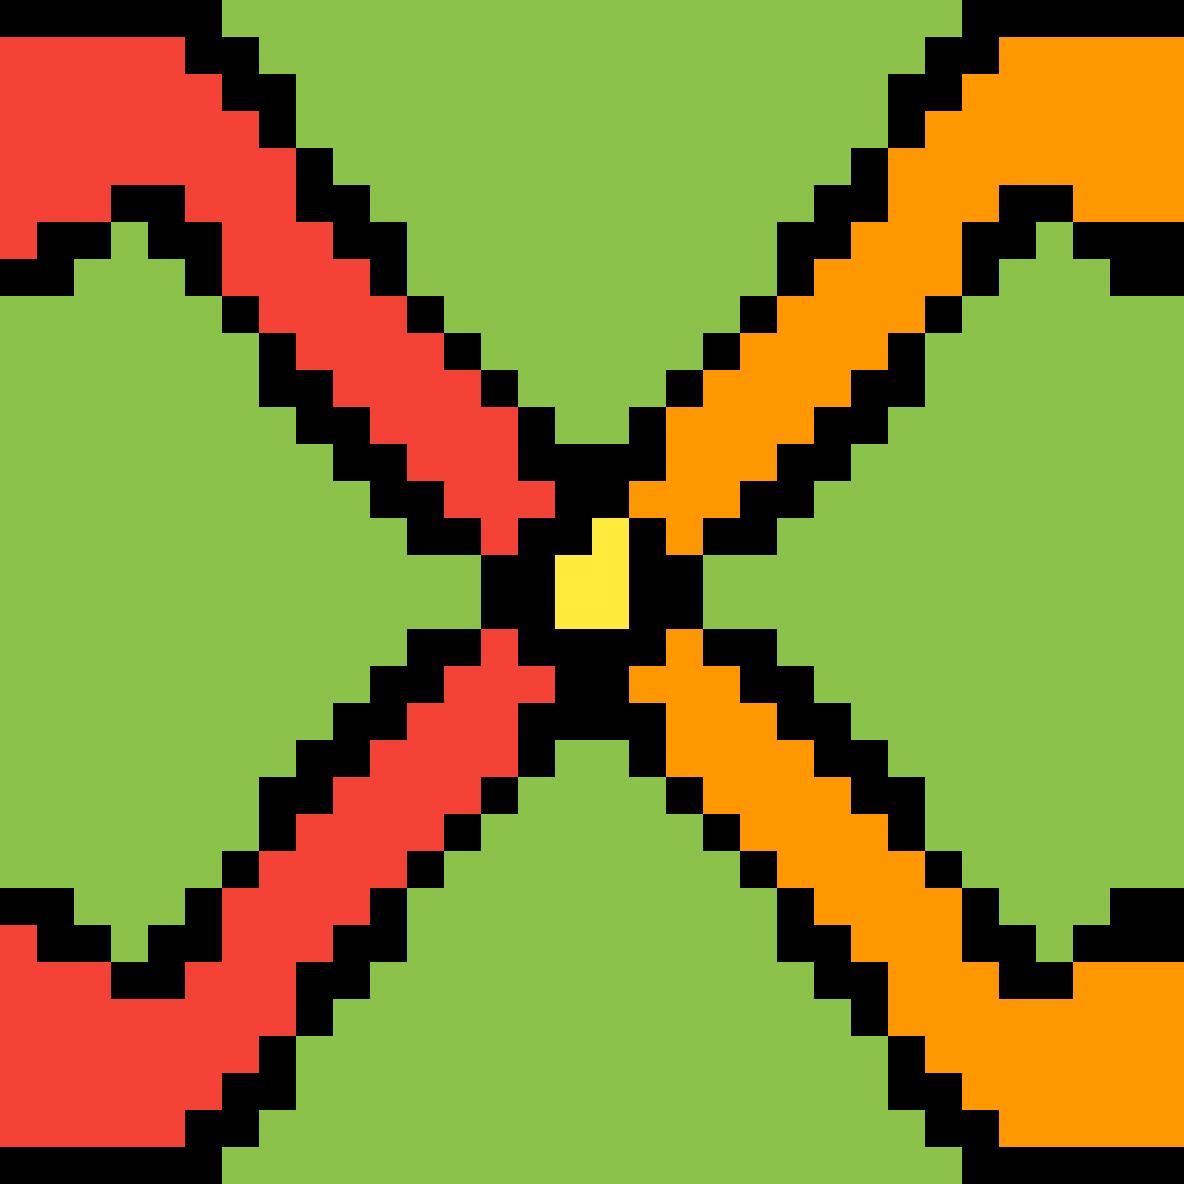 It's an X by Glitchtrap